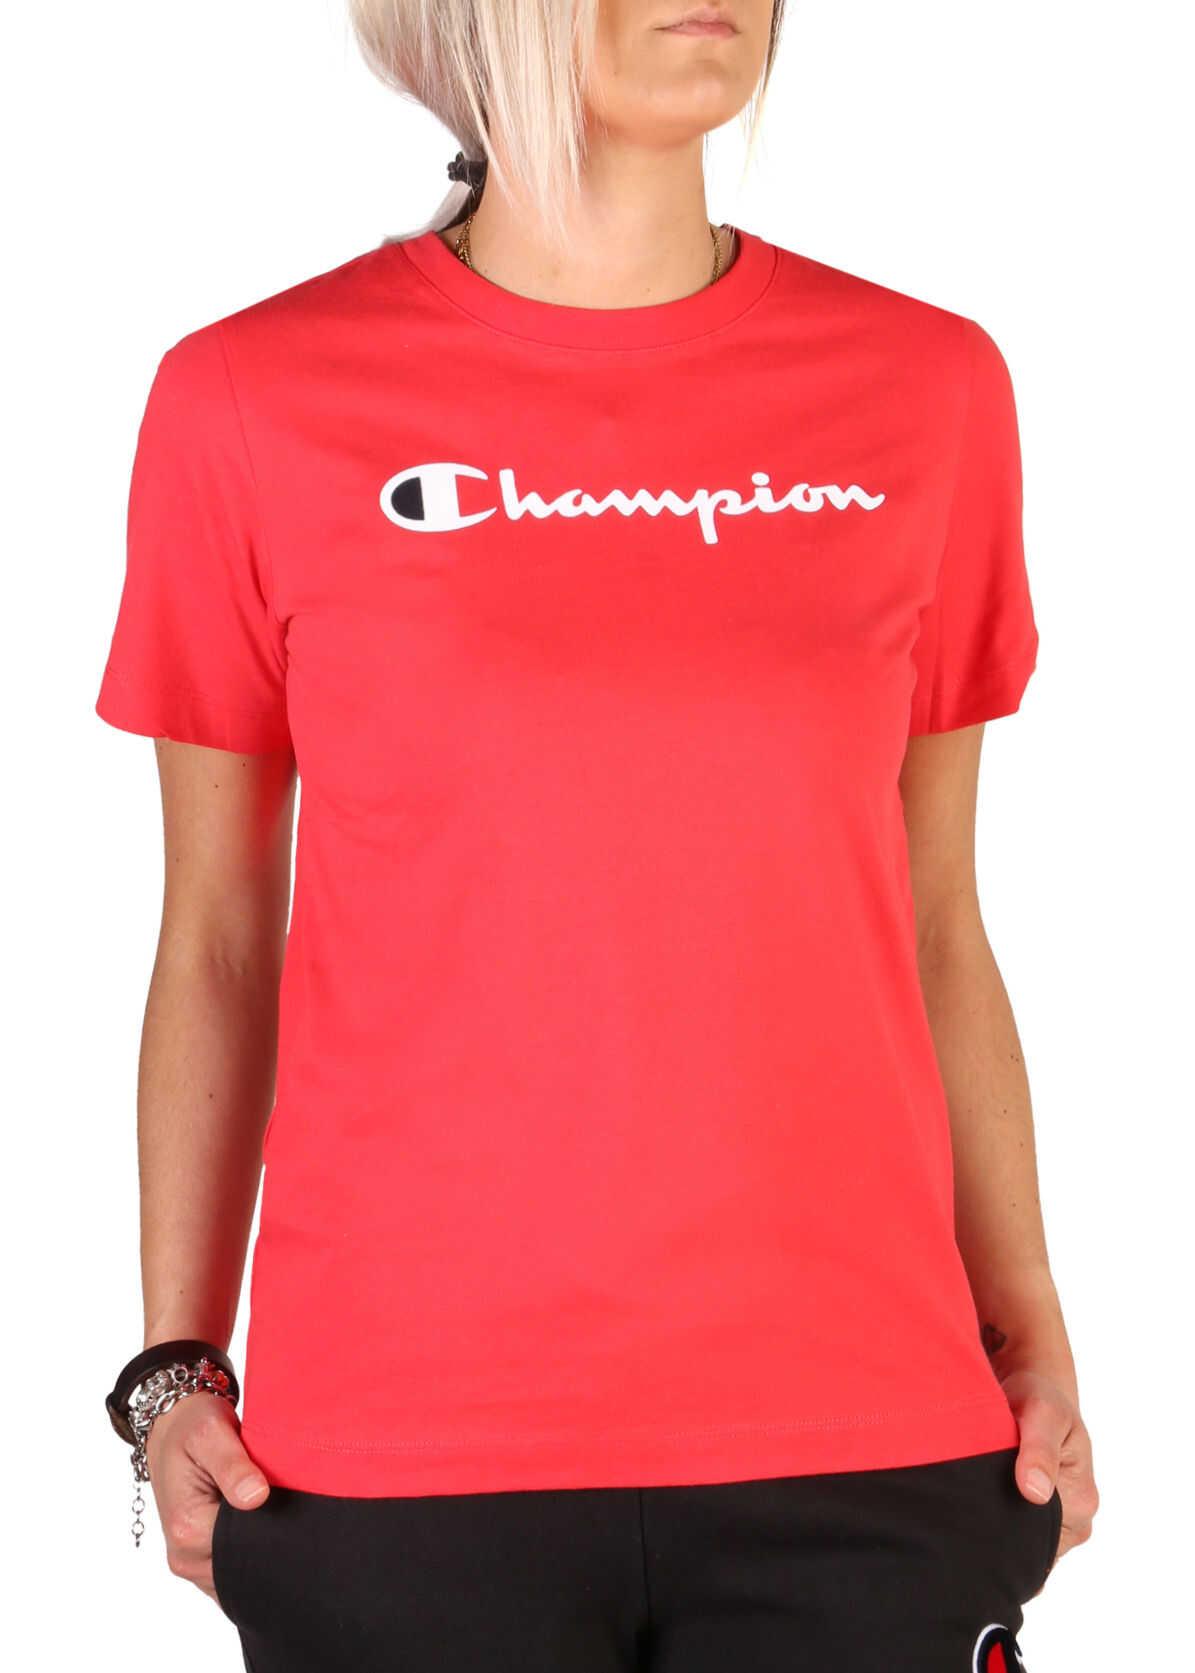 Champion 111971 RED